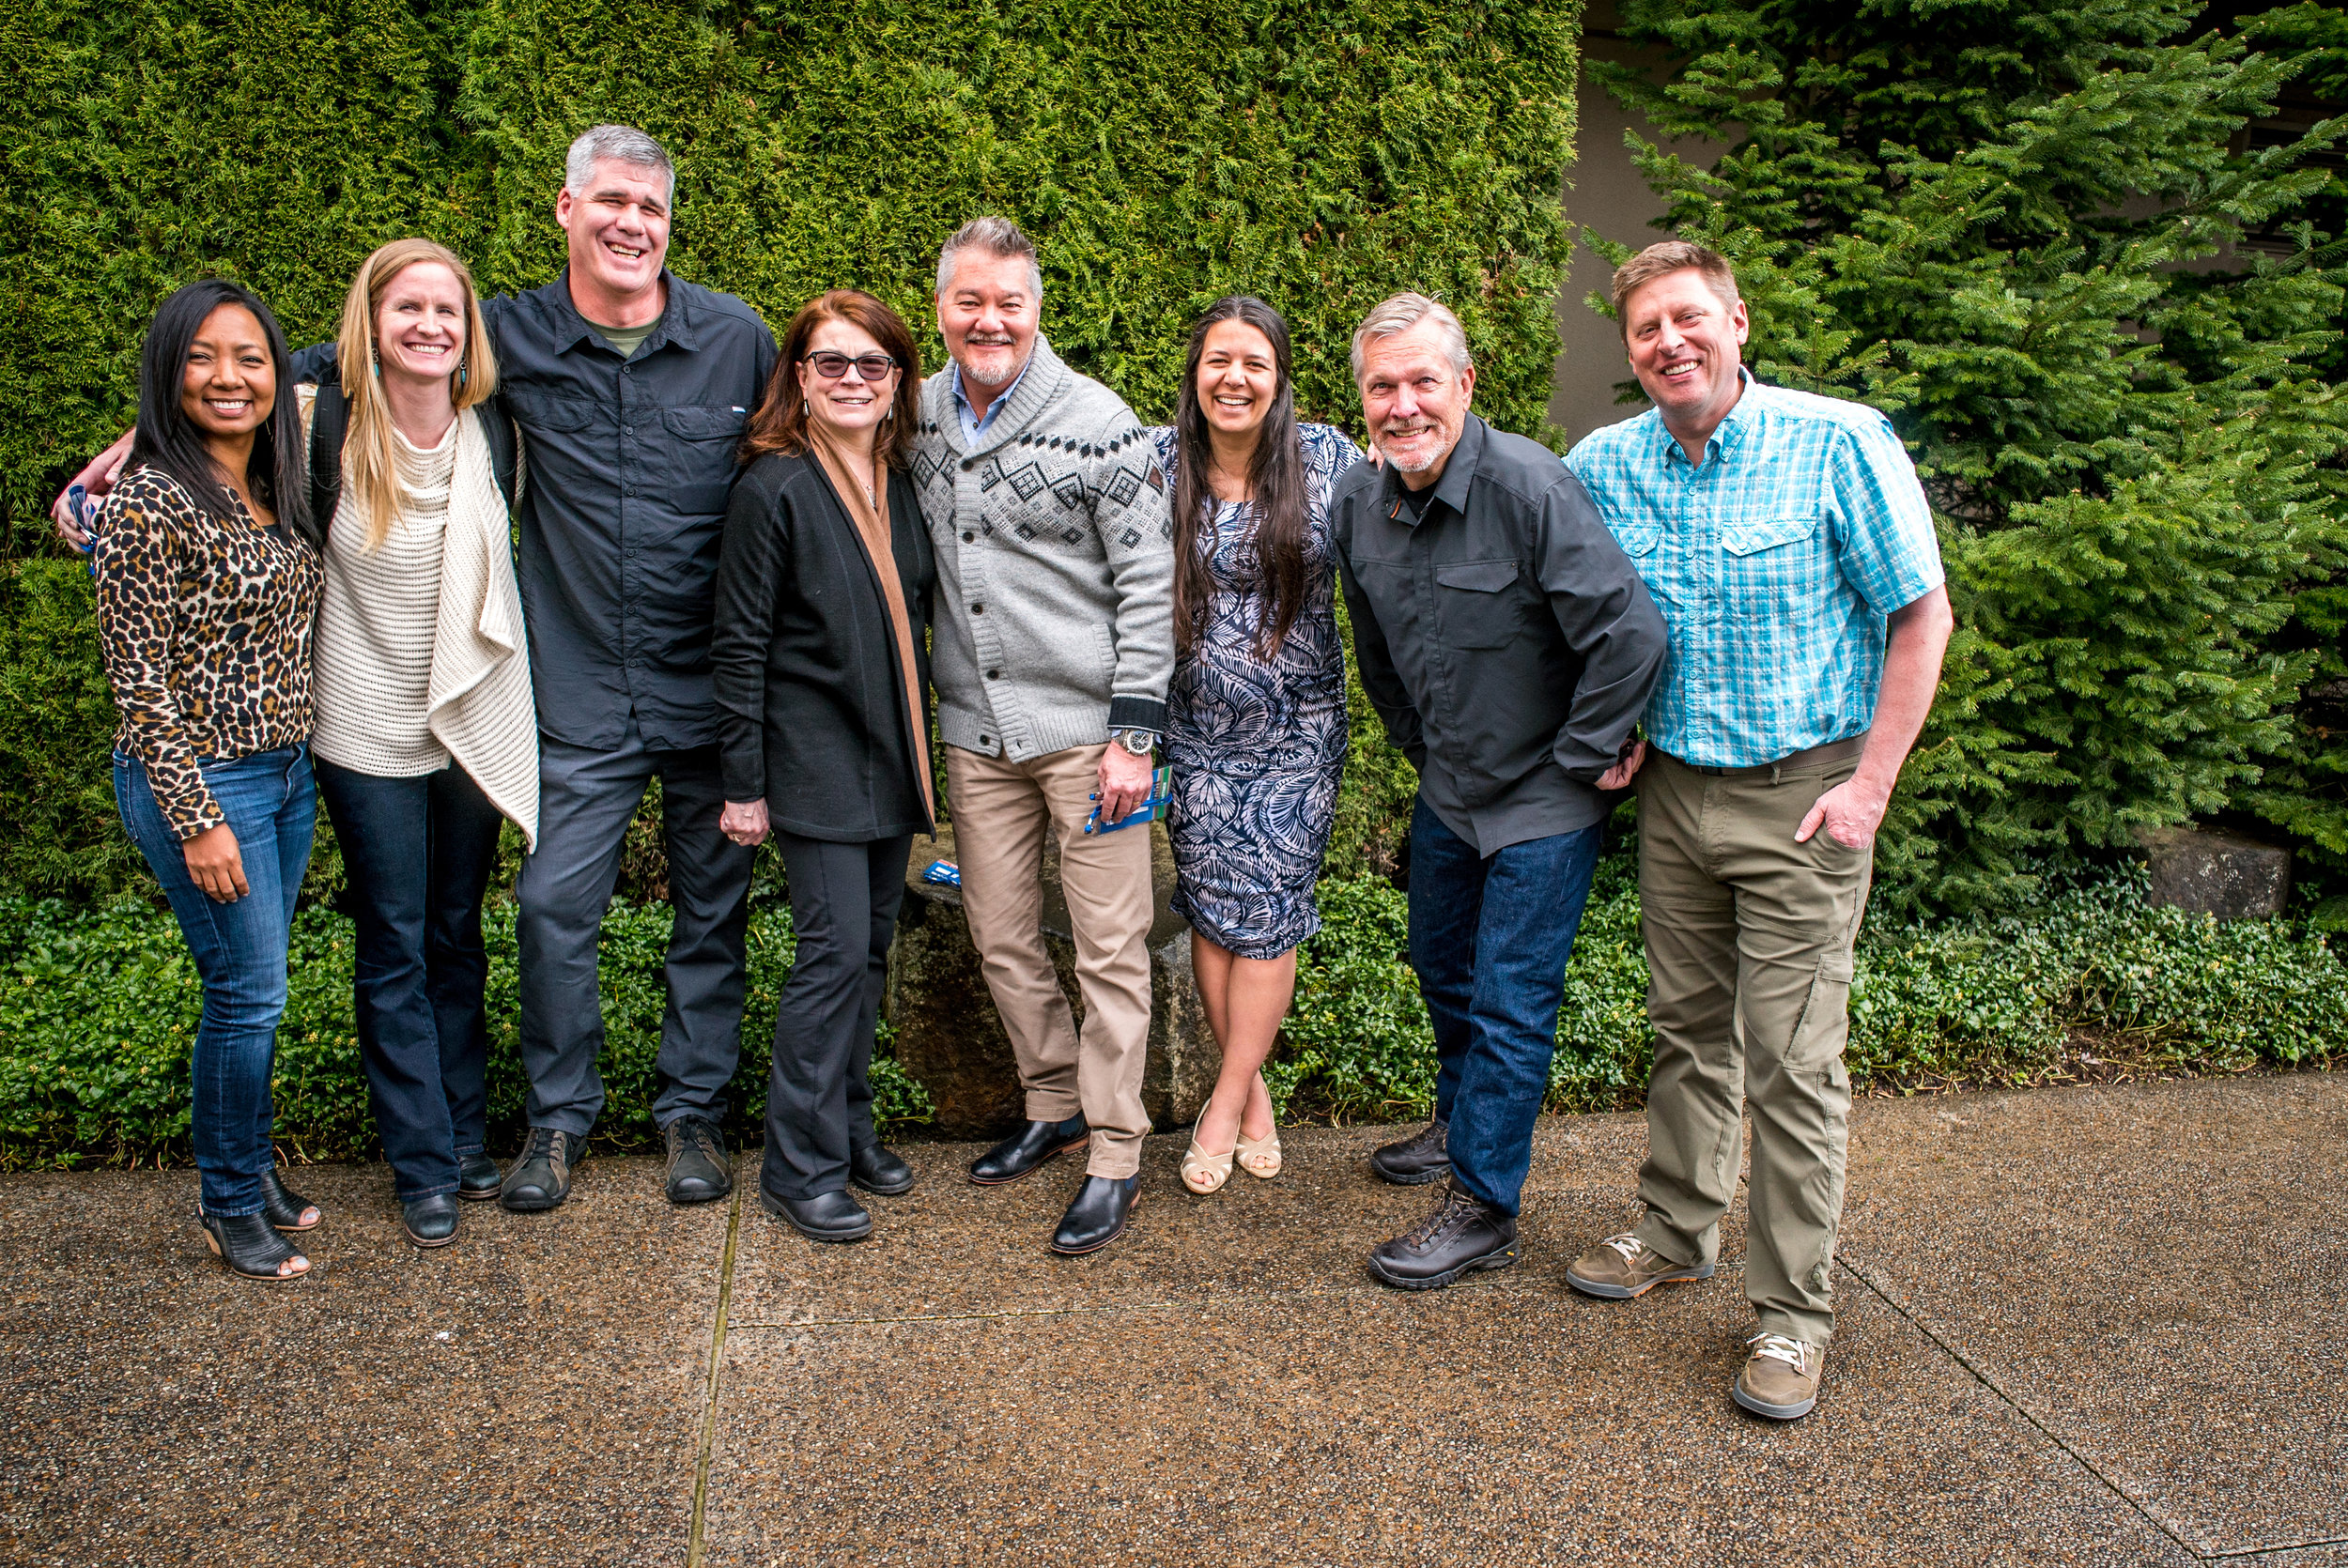 ATCF Board of Directors at Adventure Elevate, Idaho (April 2017). From left to right: Chunnie Wright, Josie Norris, Richard Edwards, Cynthia Dunbar, Roger Spatz, Soraya Shattuck, Steve Barker, Shannon Stowell